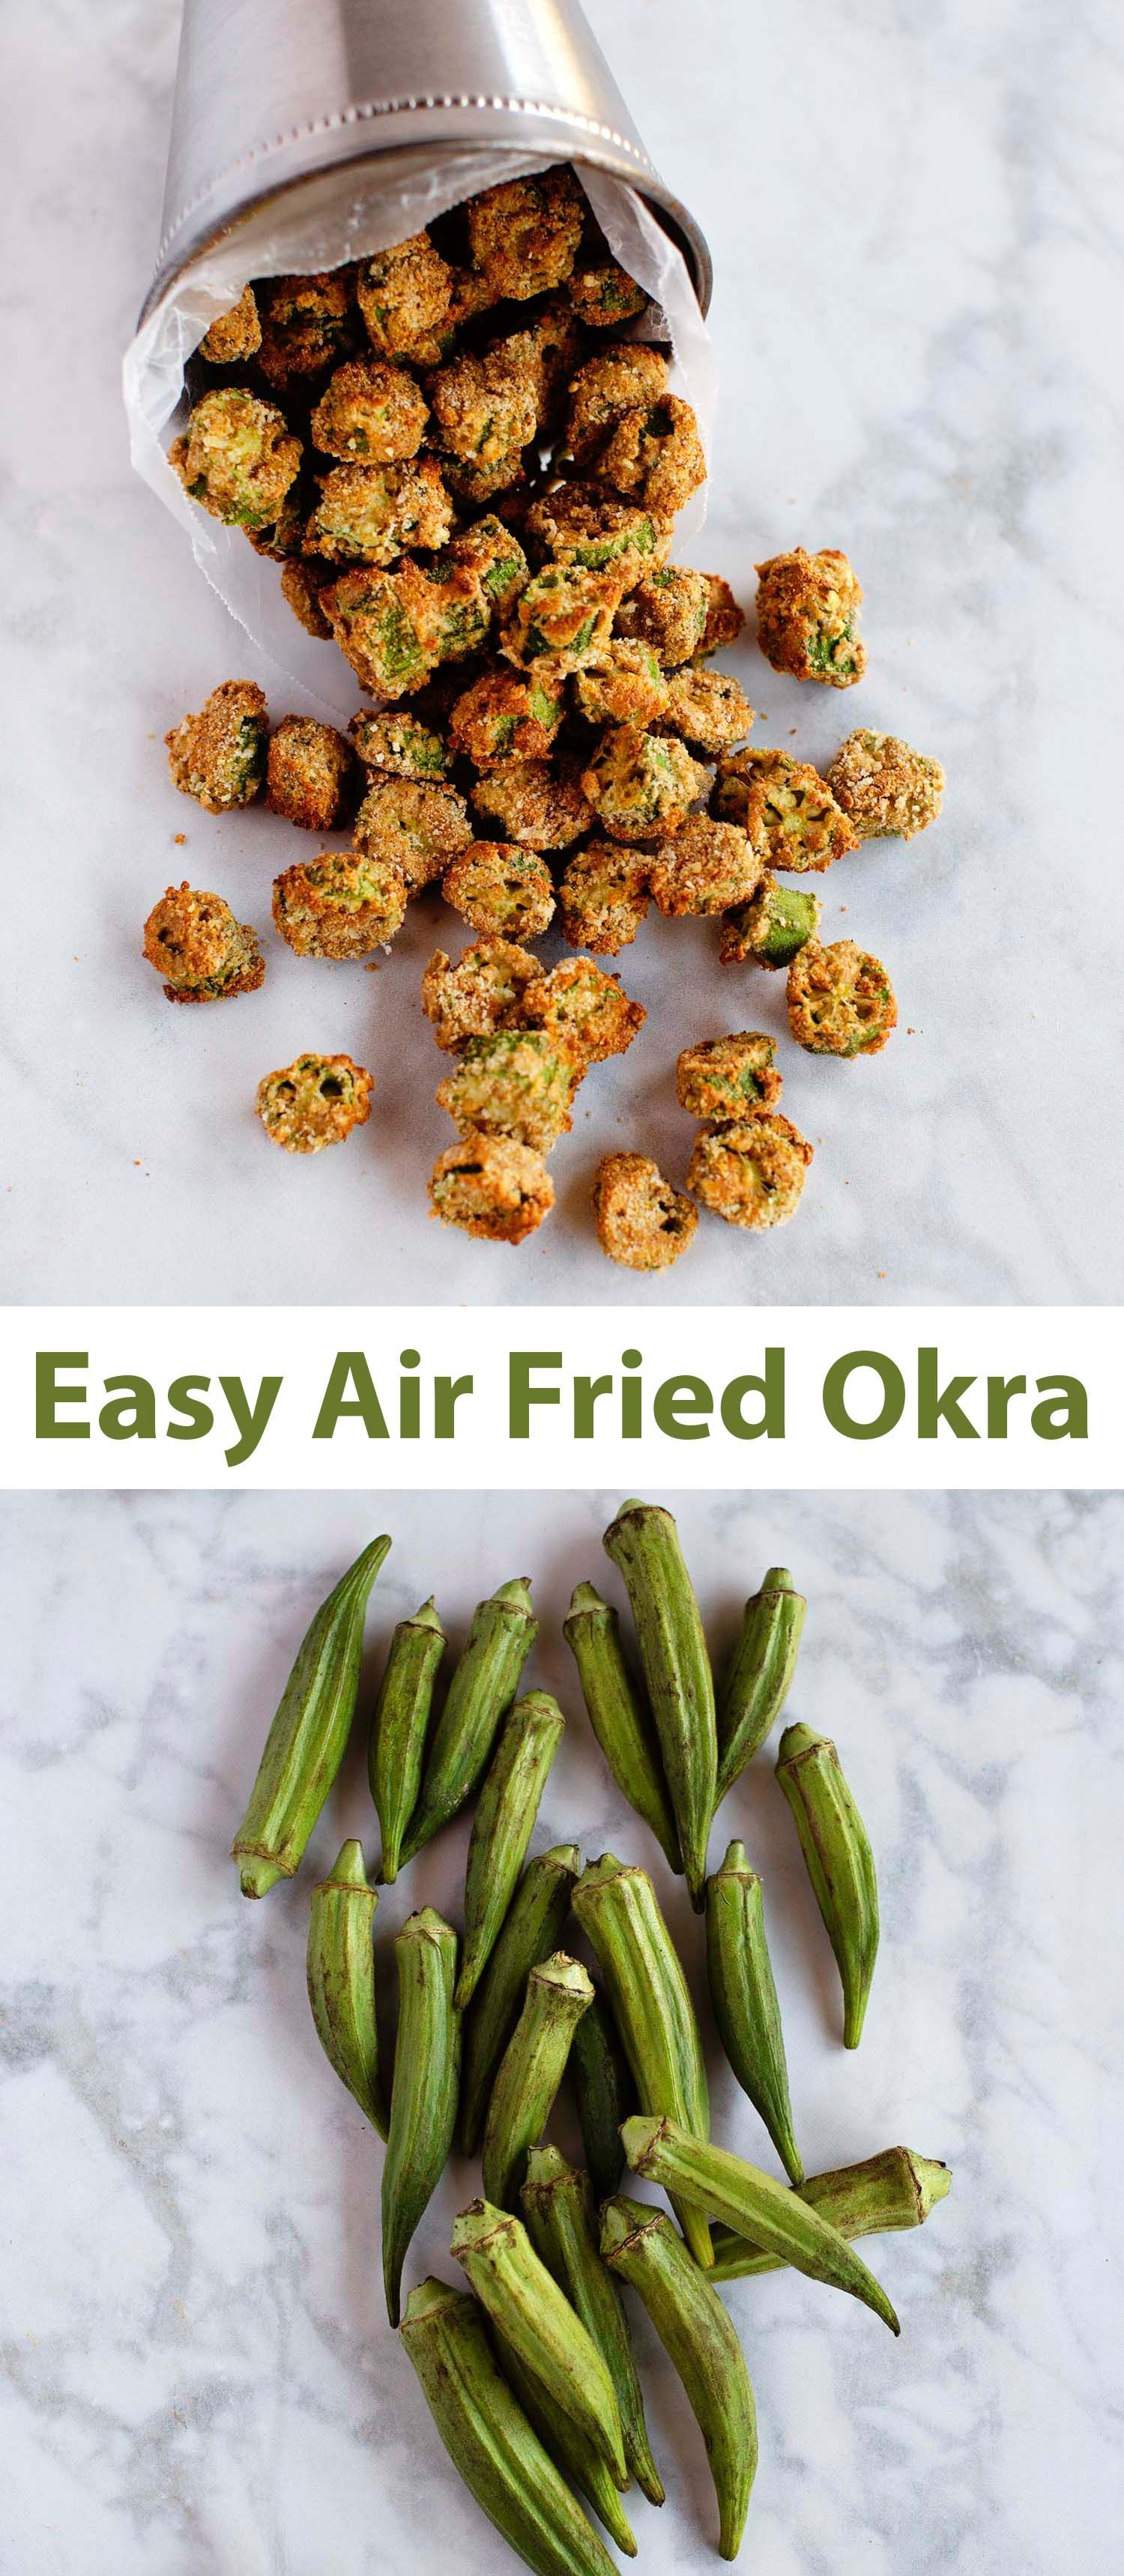 Air Fried Okra Recipe Air fryer dinner recipes, Air